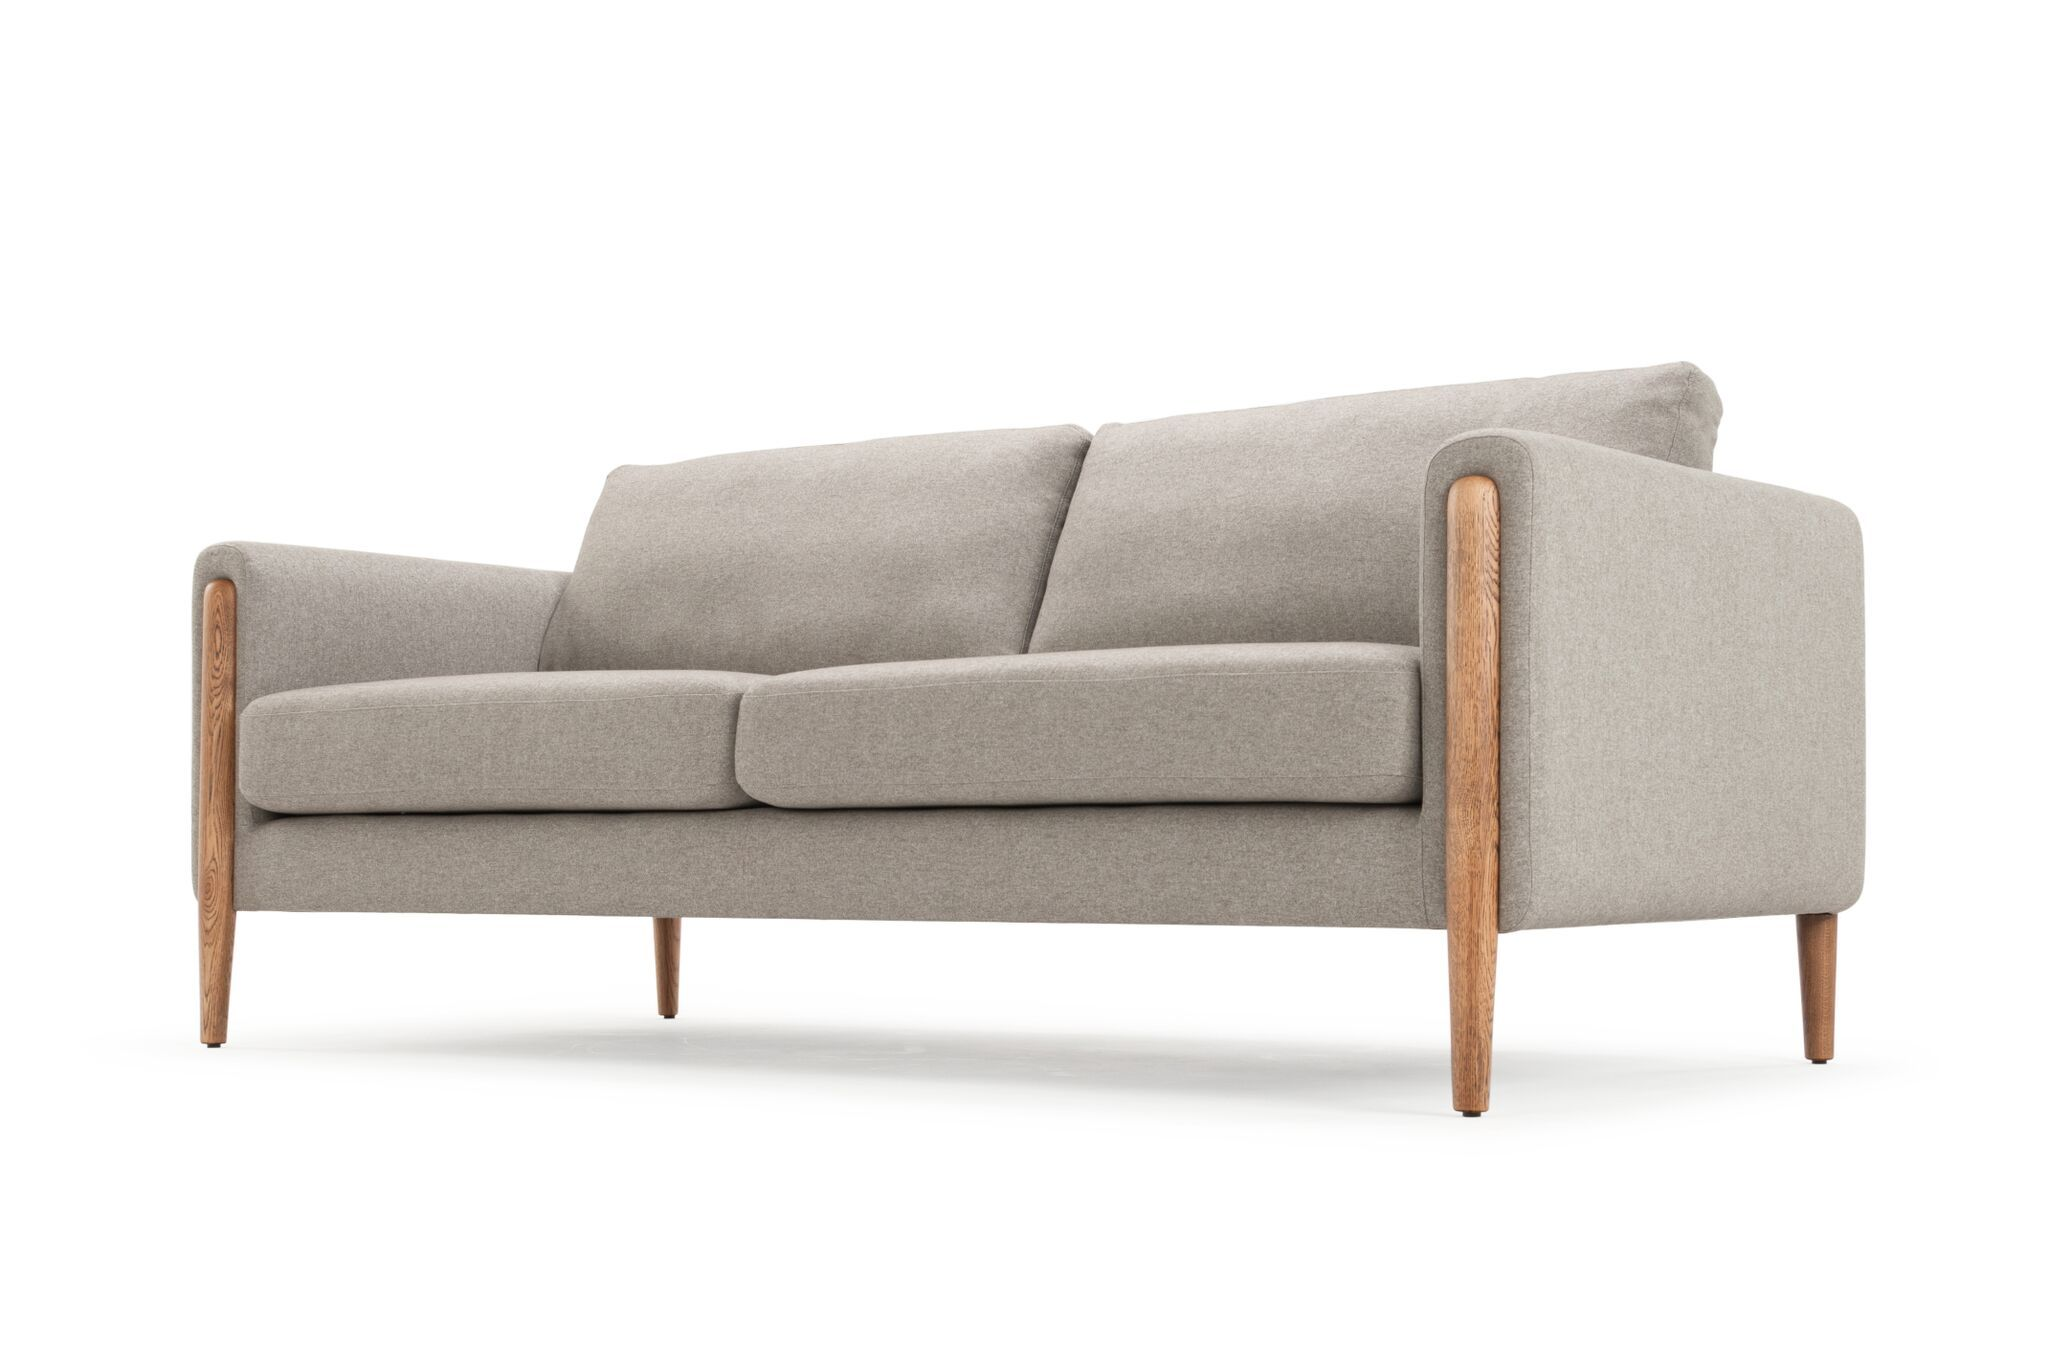 Pin By Sofacompanyza On Let S Get Comfy Sofa Contemporary Sofa Sofa Design